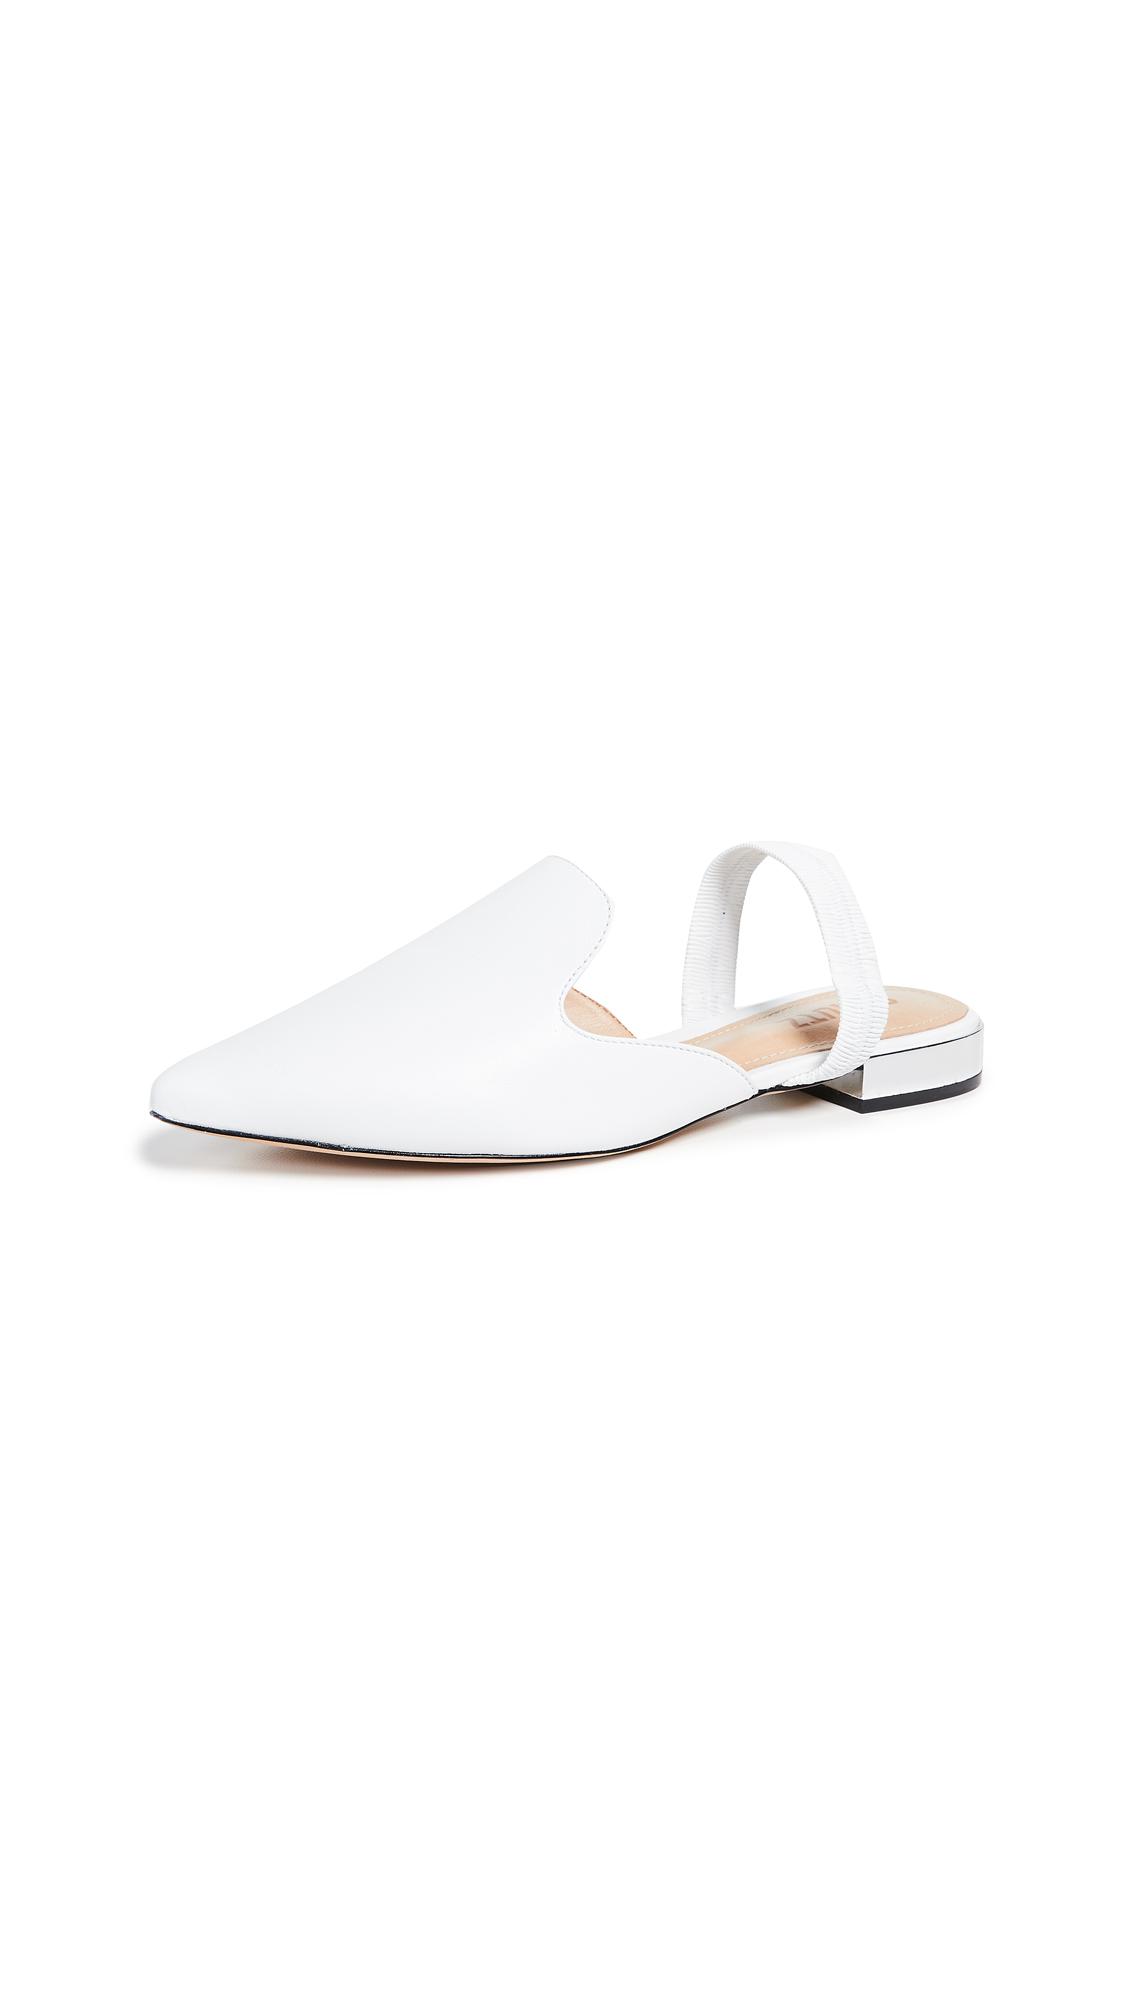 Schutz Ylanna Slingback Flats - White